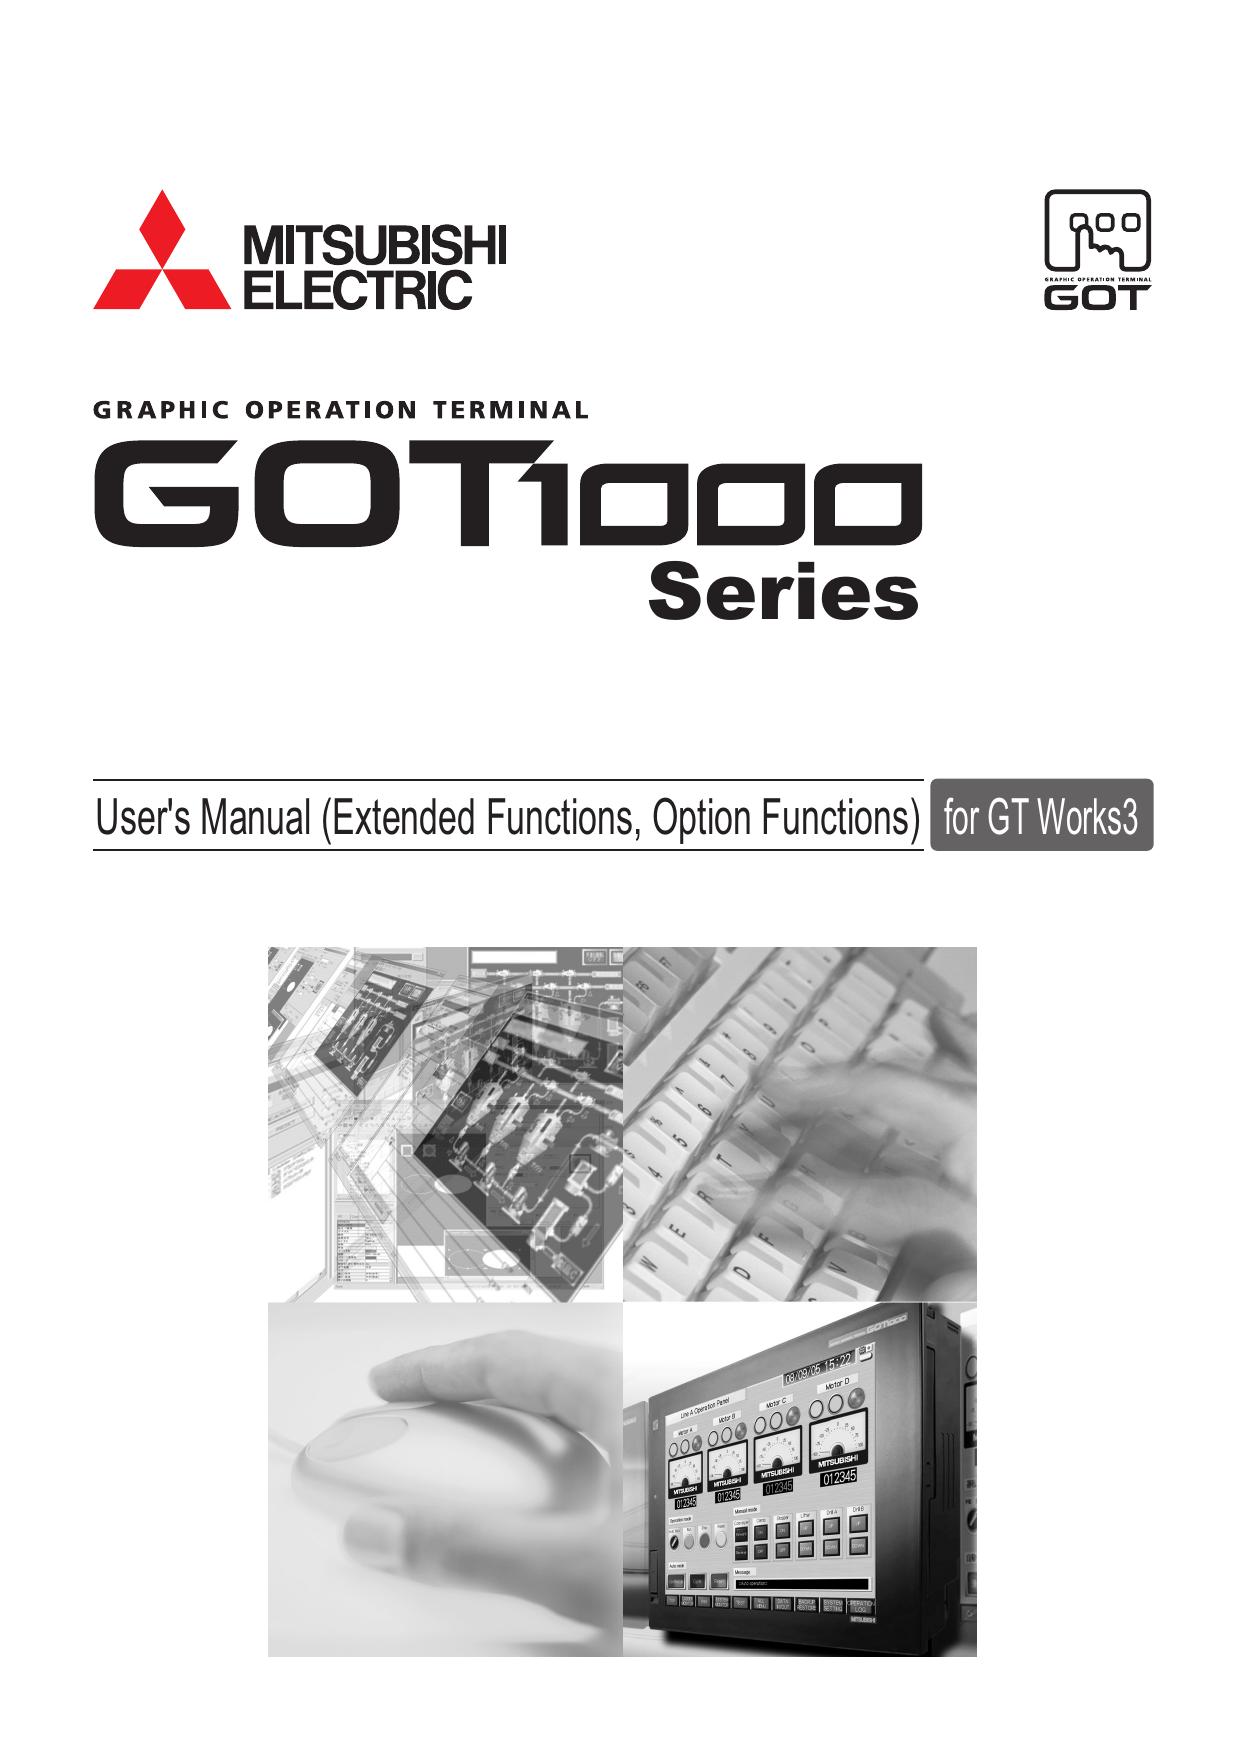 Got1000 Series Users Manual Extended 1373 X 1008 377 Kb Jpeg Current Sensor Circuit